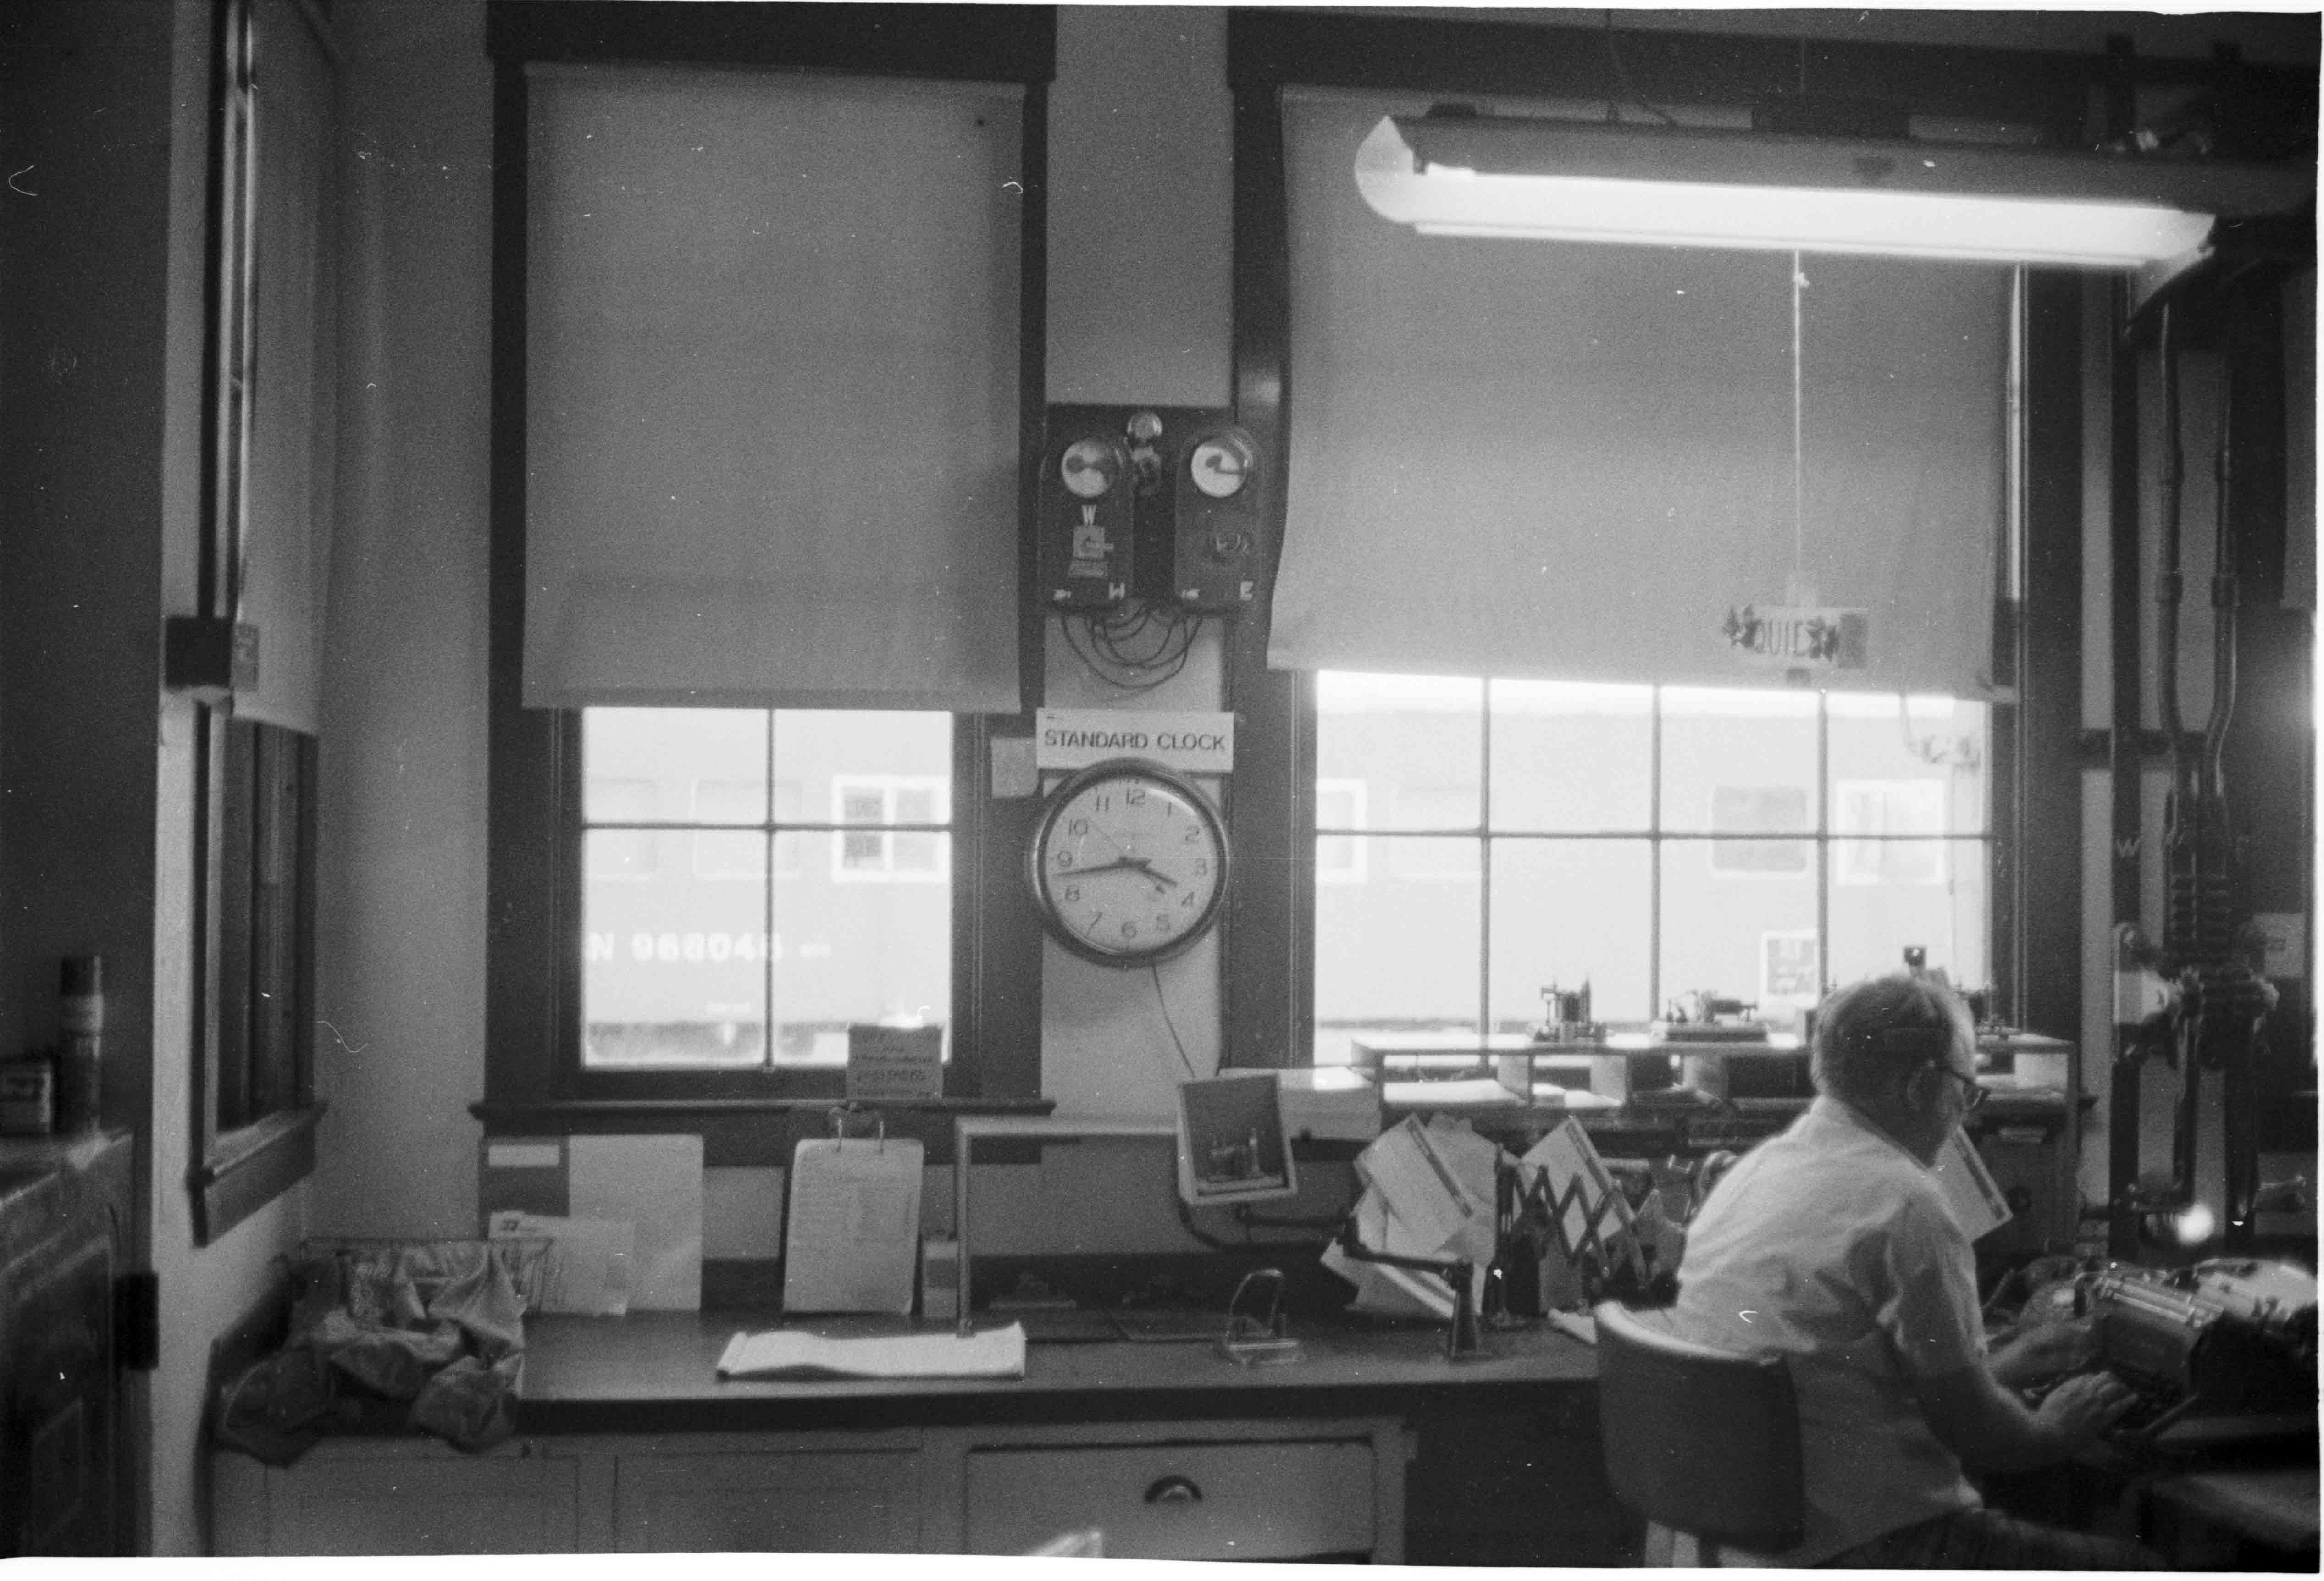 Operations center. Photograph courtesy of Charles V. Mutschler